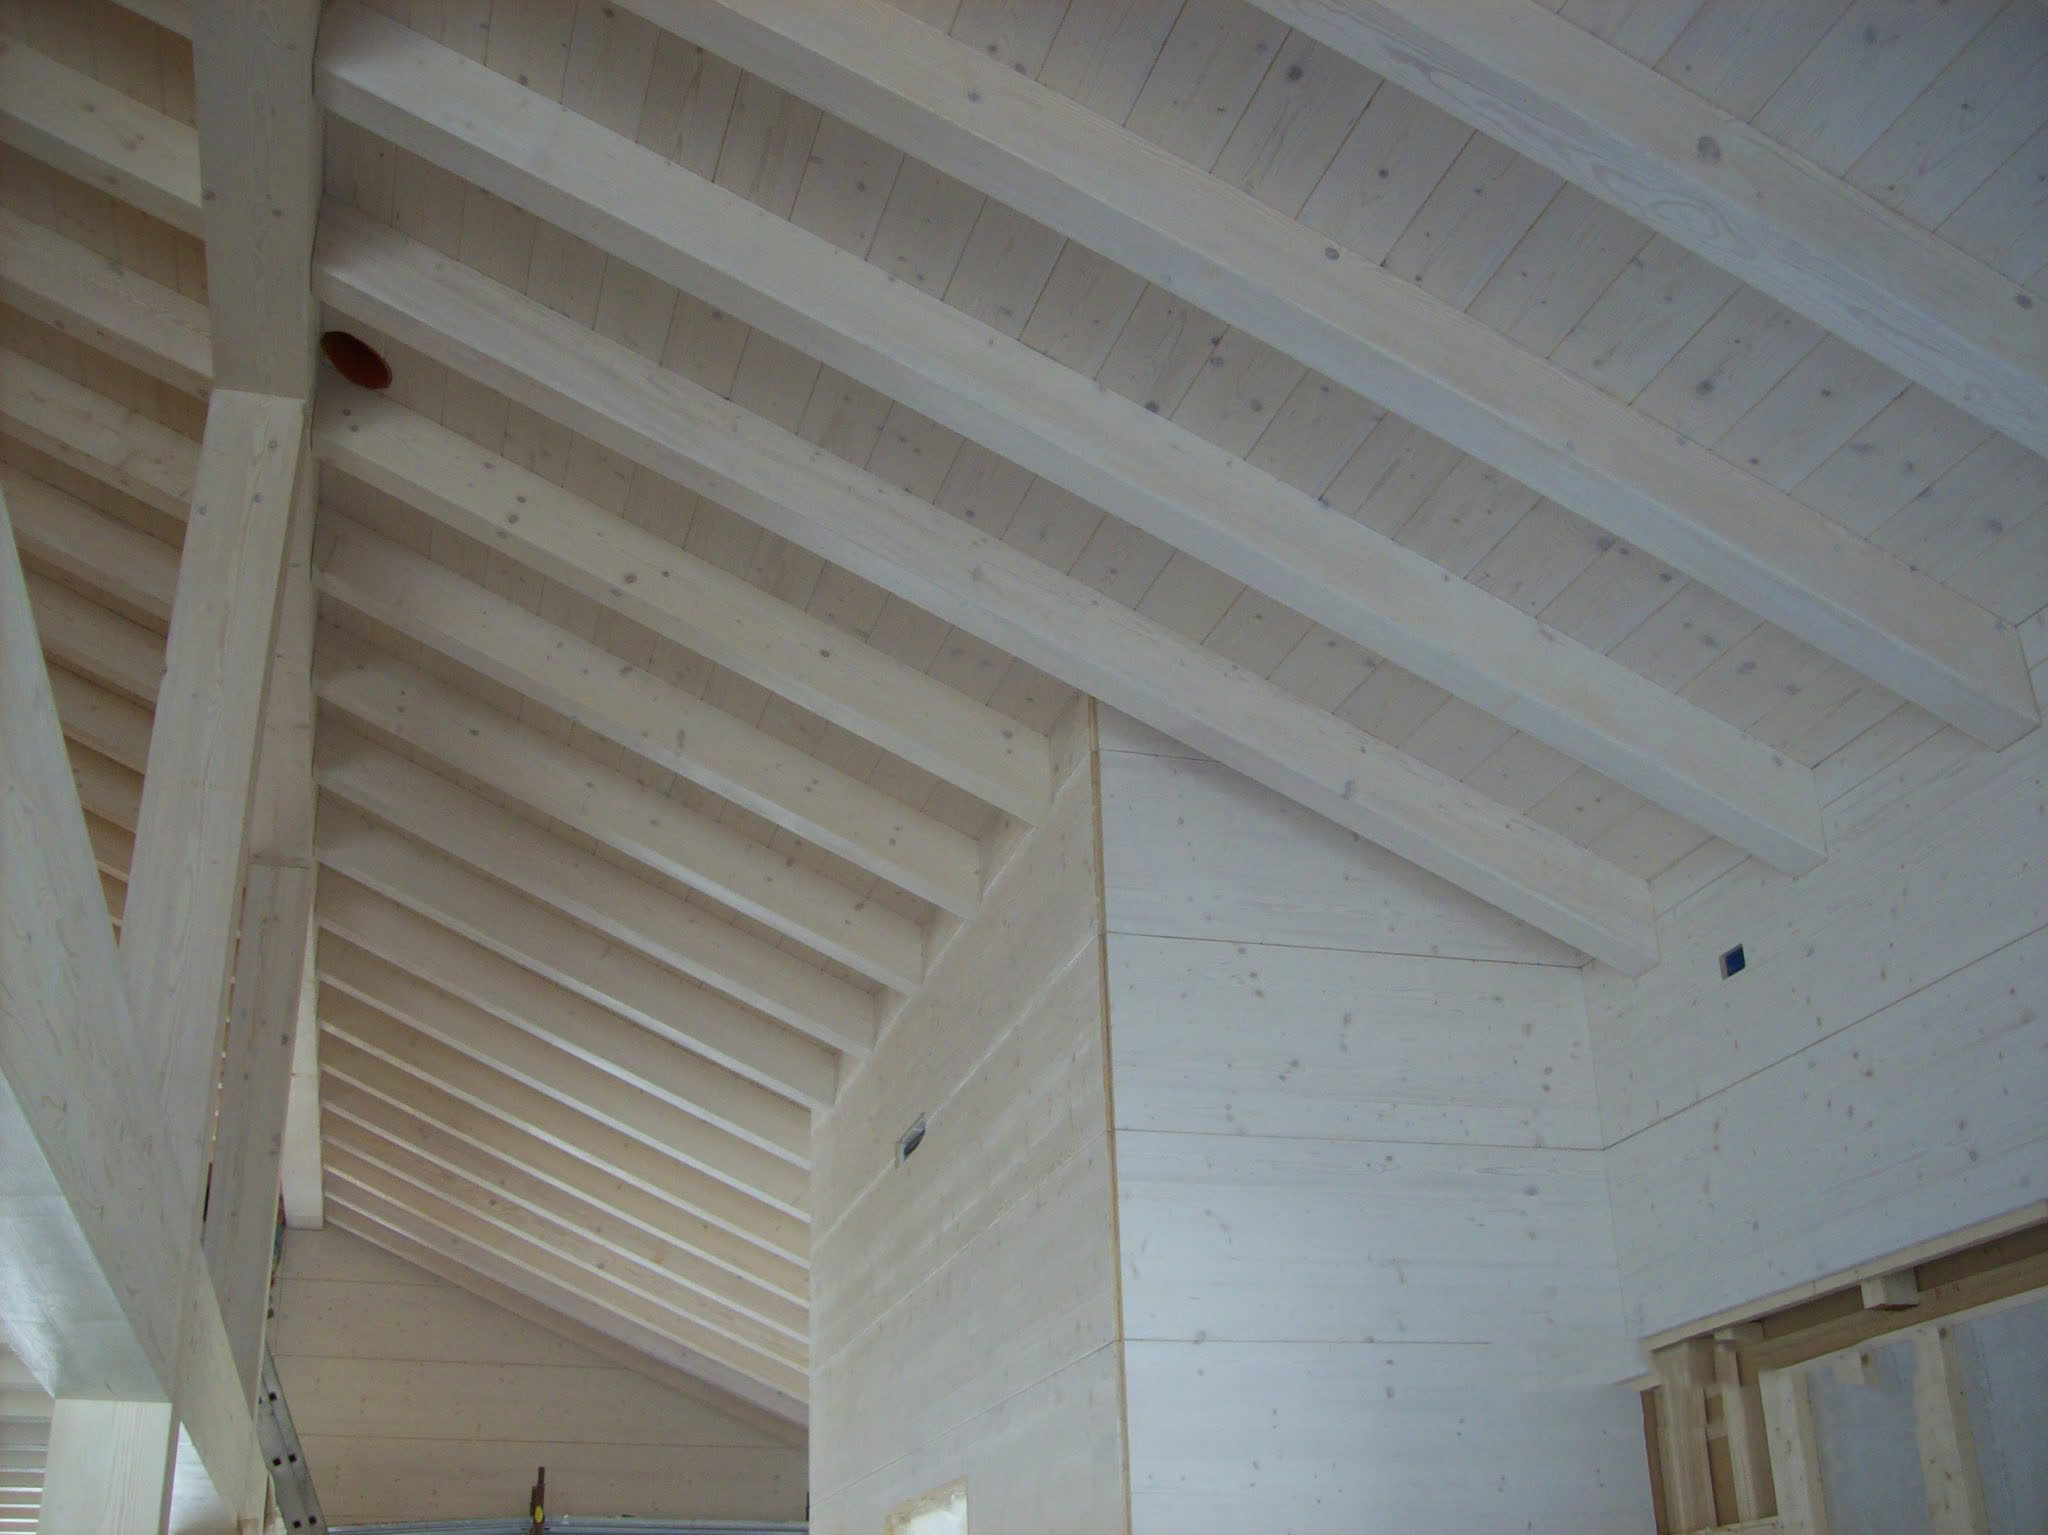 Legno sbiancato tetto - Legno sbiancato tetto ...